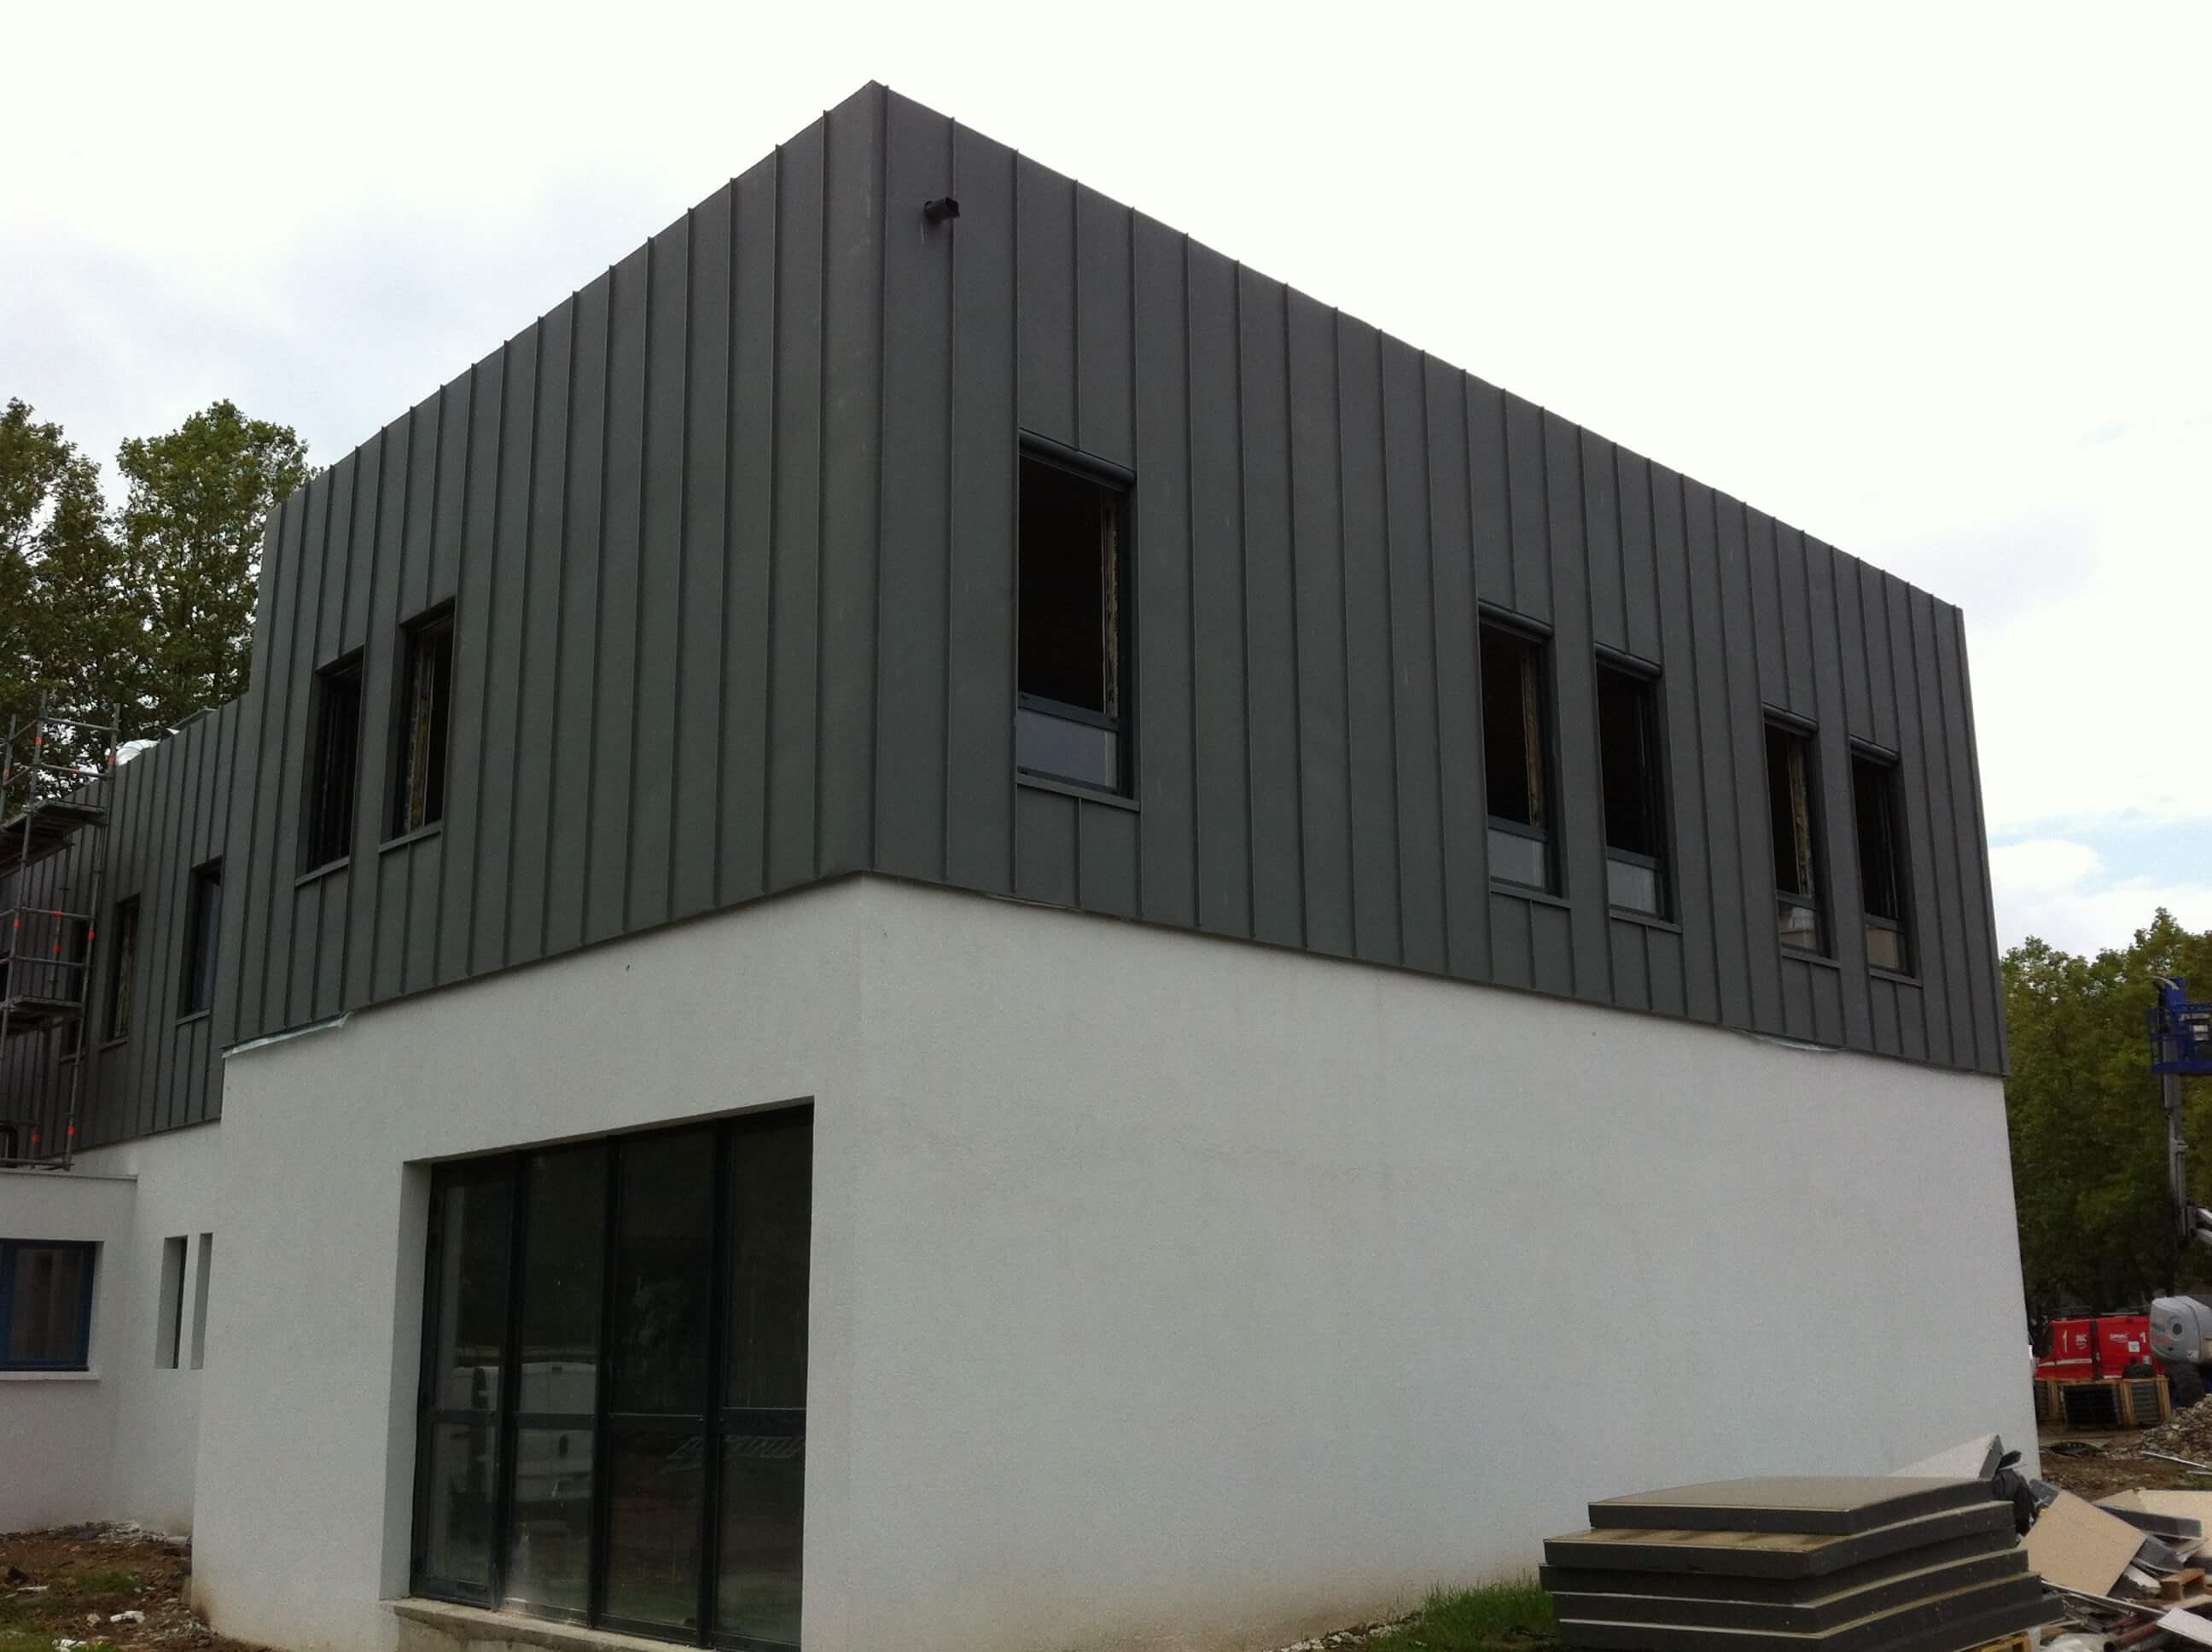 maison ossature bois bardage zinc ventana blog. Black Bedroom Furniture Sets. Home Design Ideas